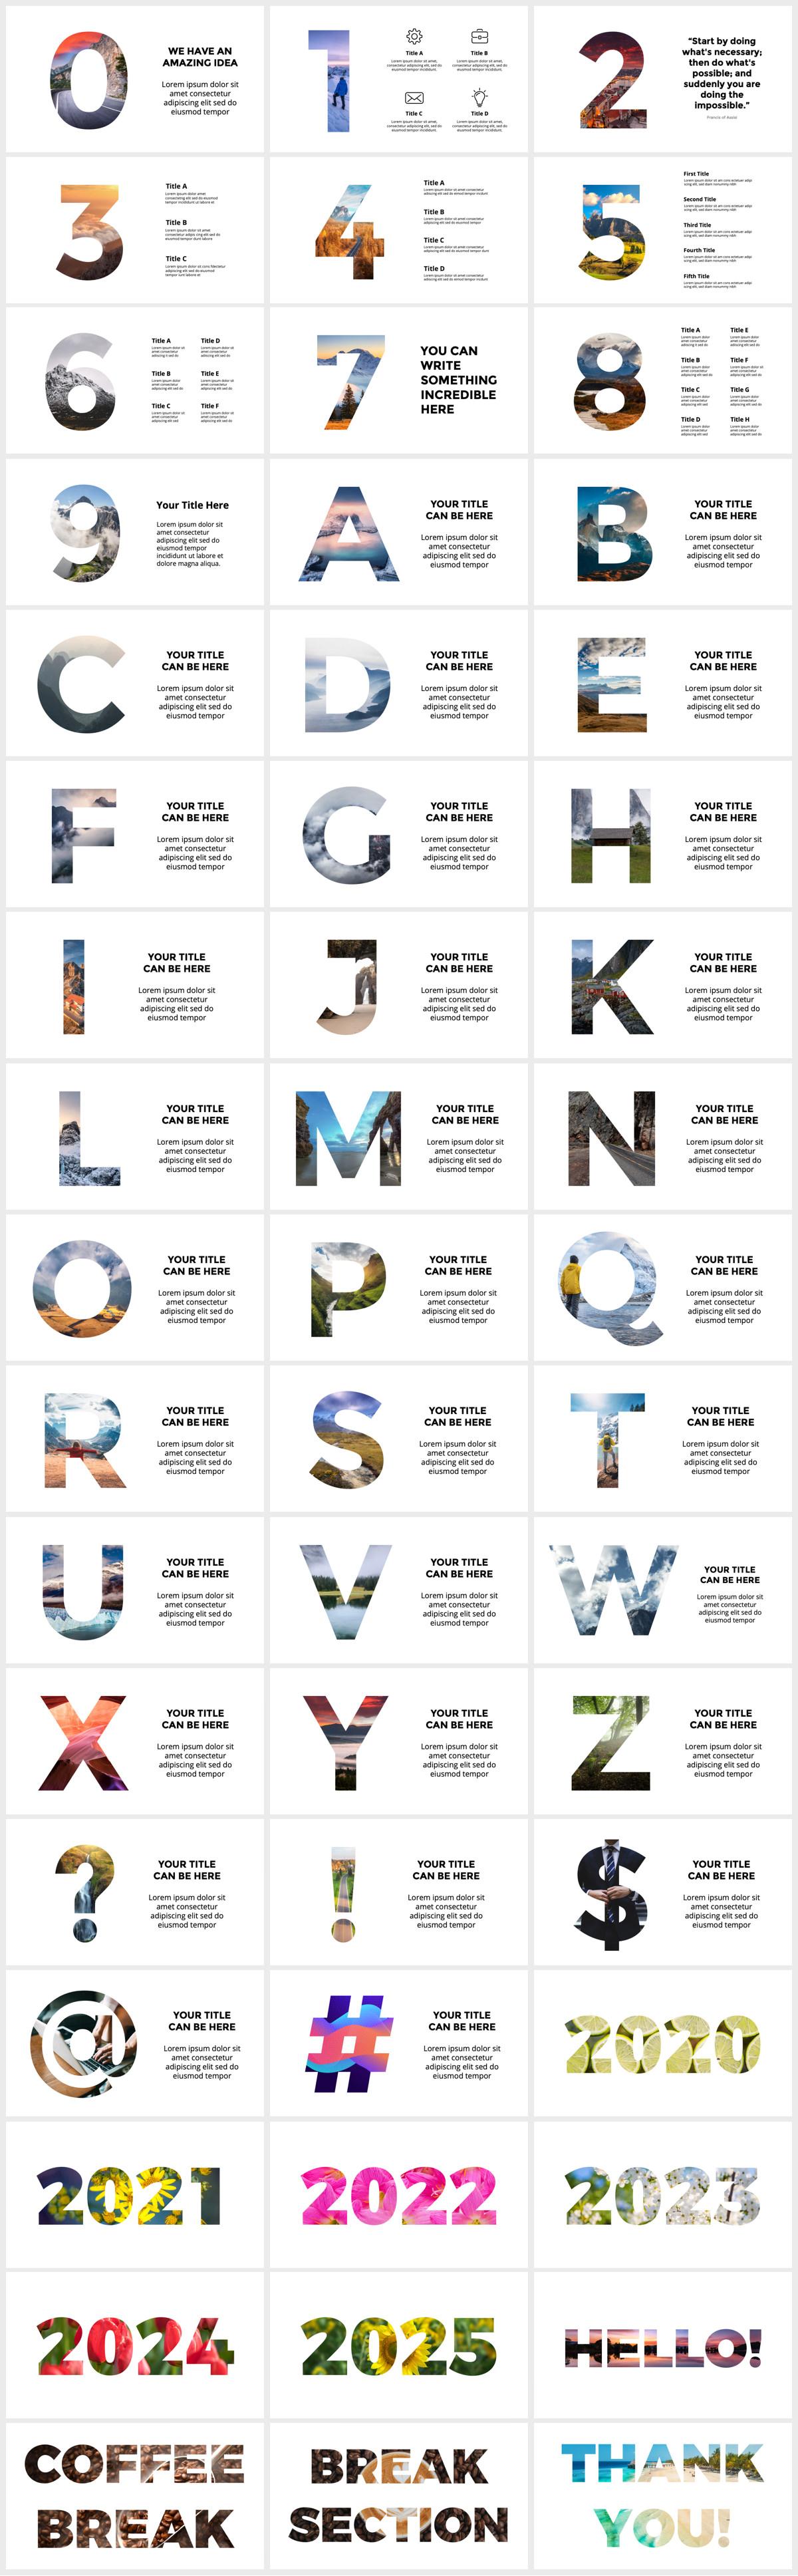 Huge Infographics Bundle! Lifetime Updates! PowerPoint, Photoshop, Illustrator. - 158